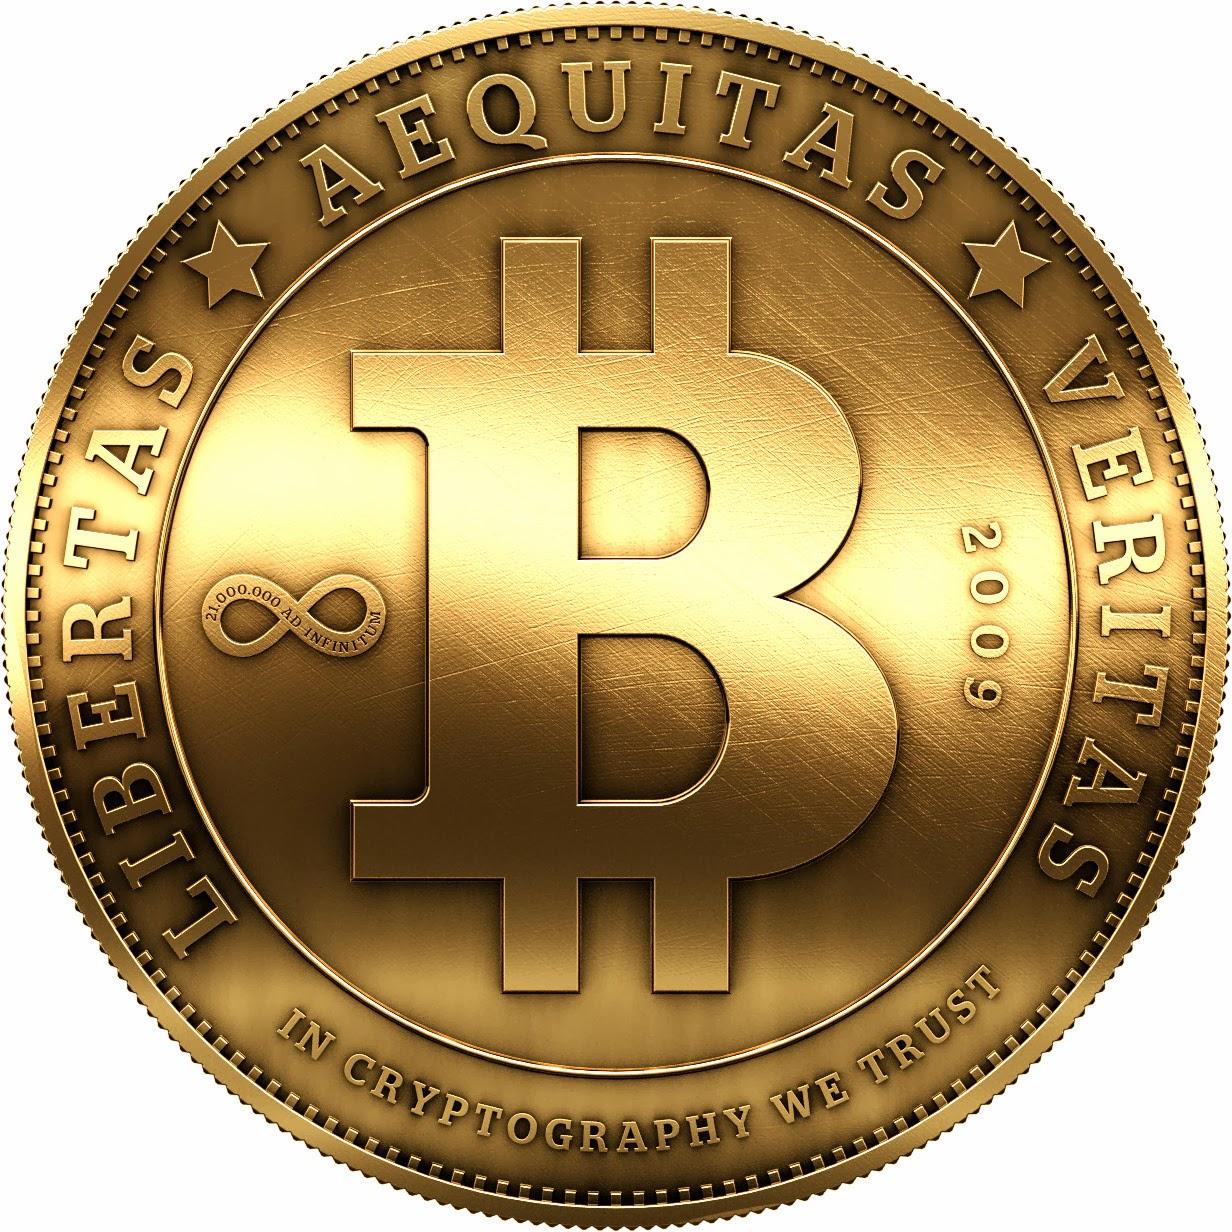 Awas, Botnet Baru Mengancam Para Penambang Bitcoin